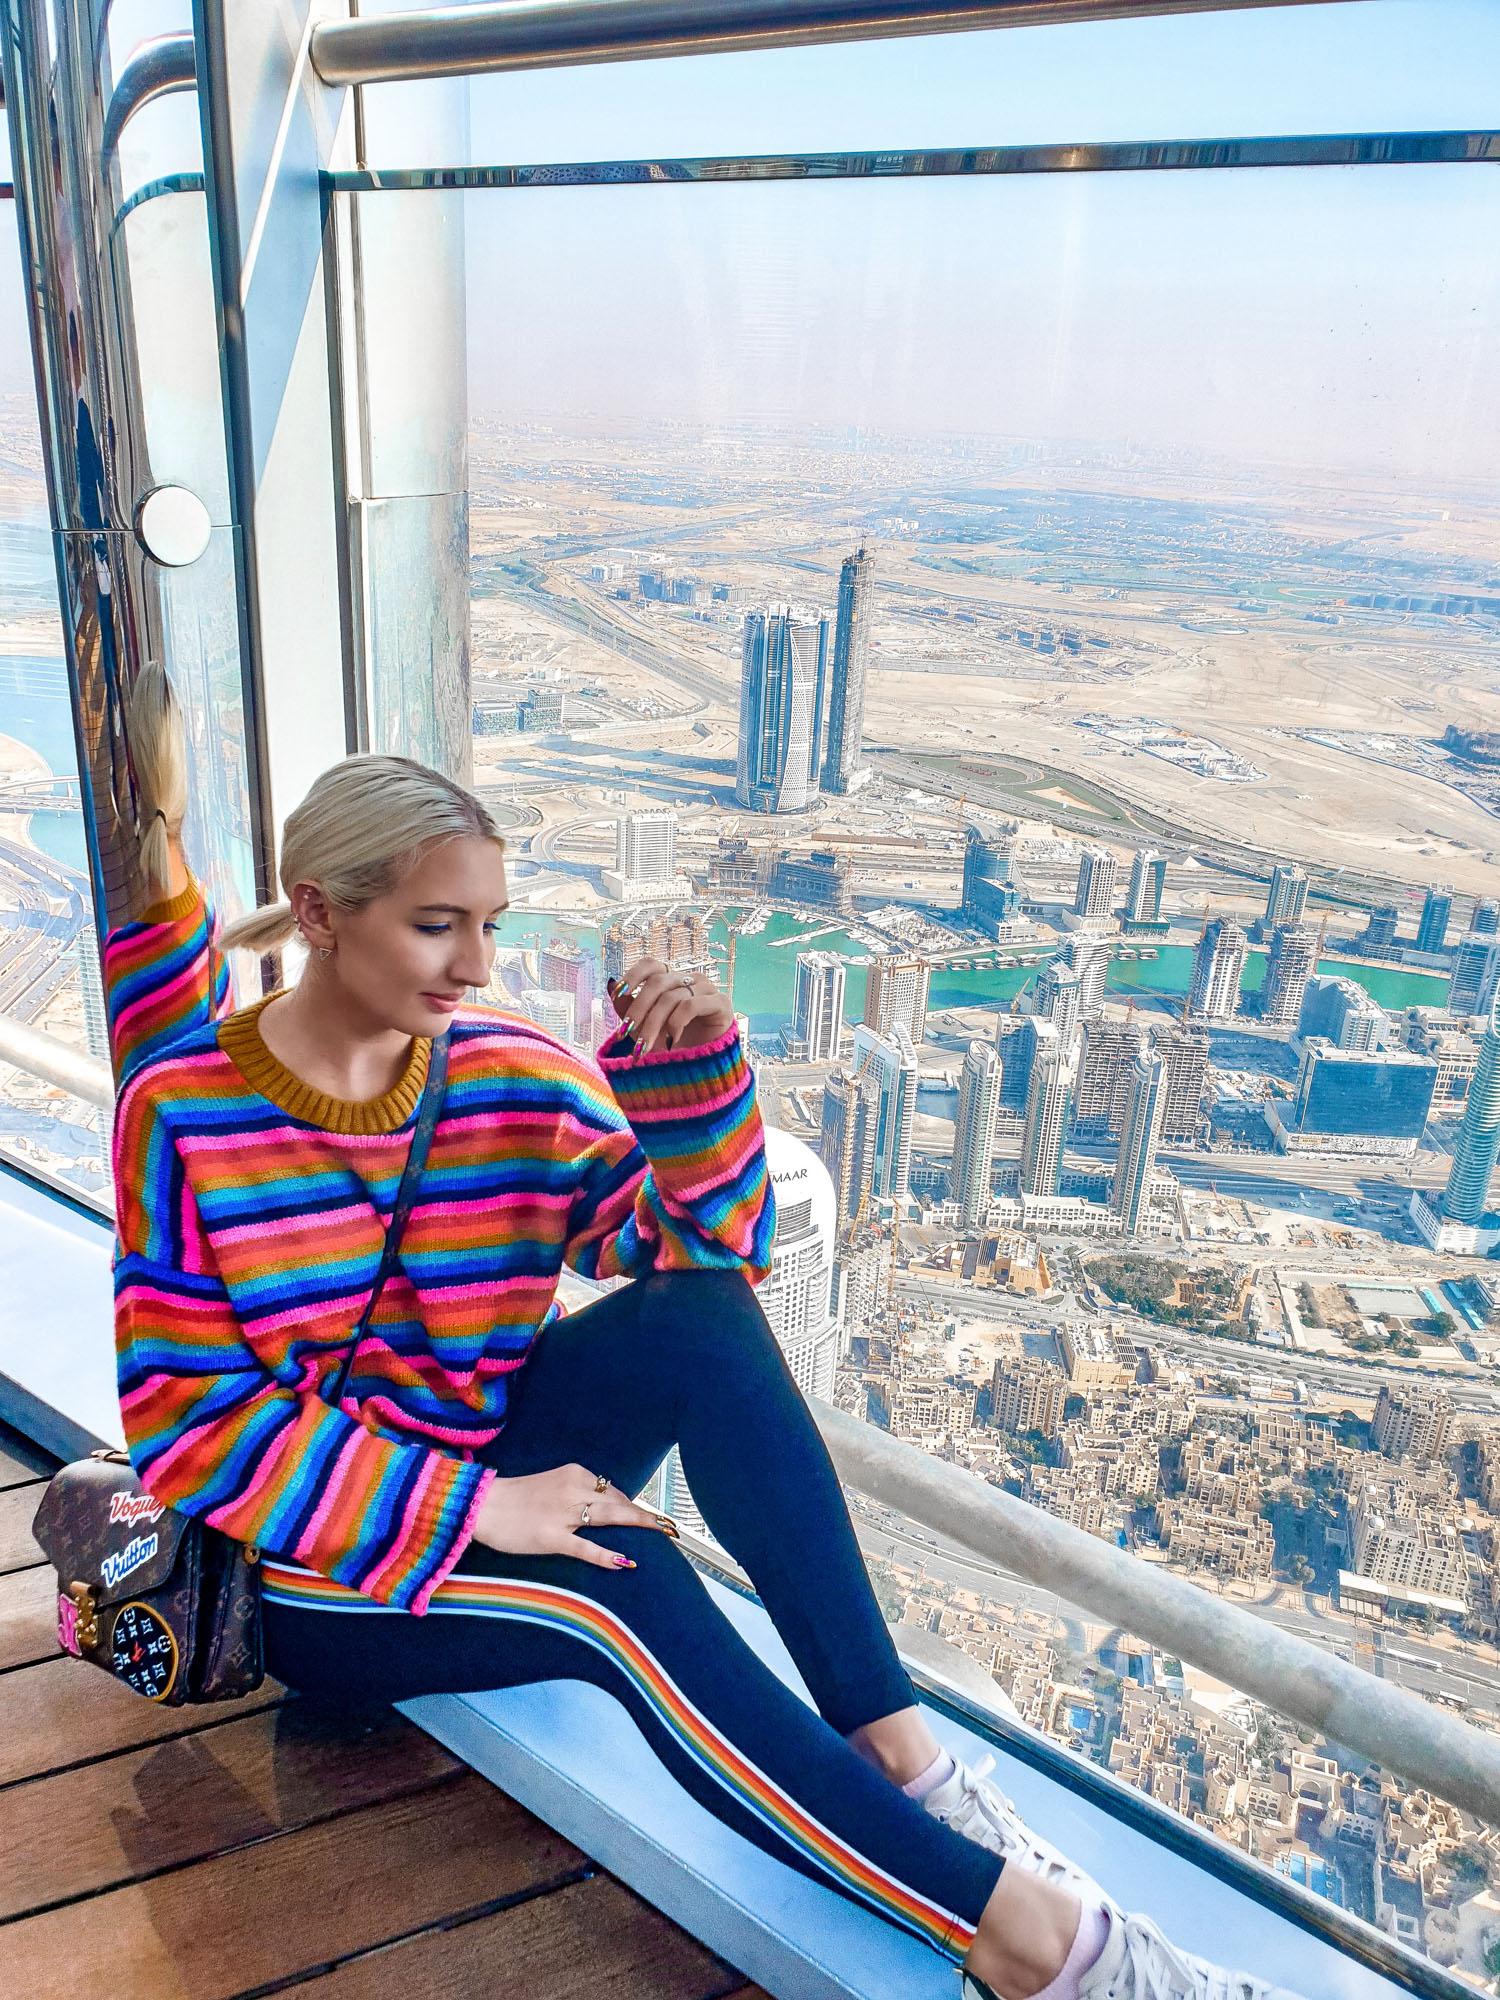 At The Top Burj Khalifa: outdoors